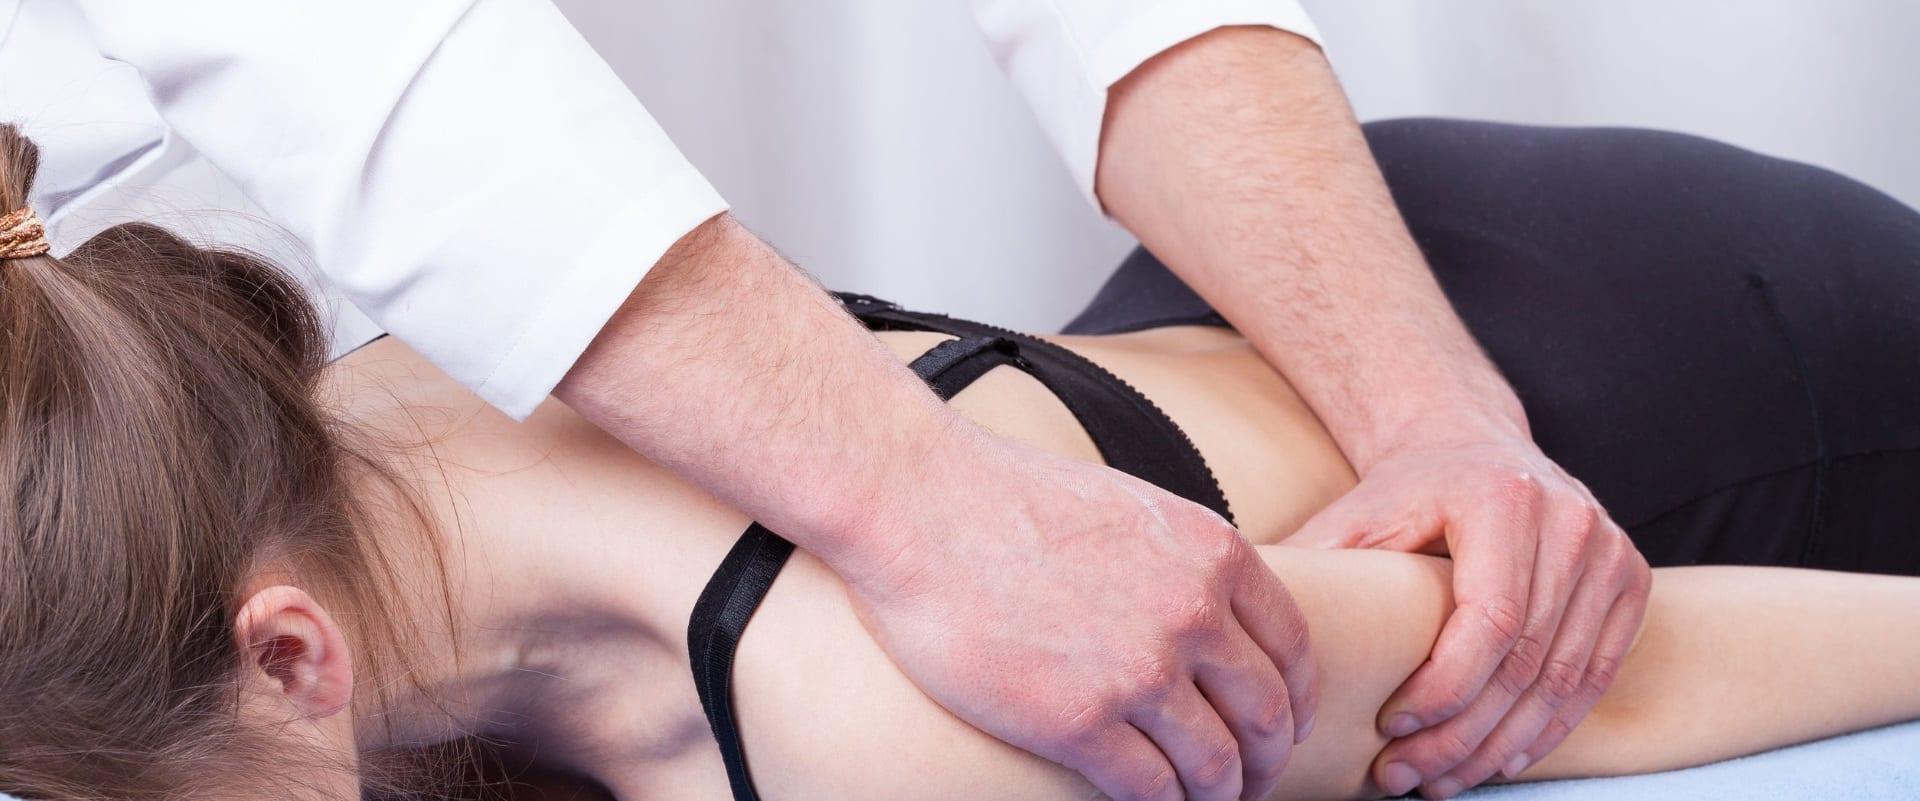 Exercise and ergonomic advice; Plympton Osteopathic Clinic